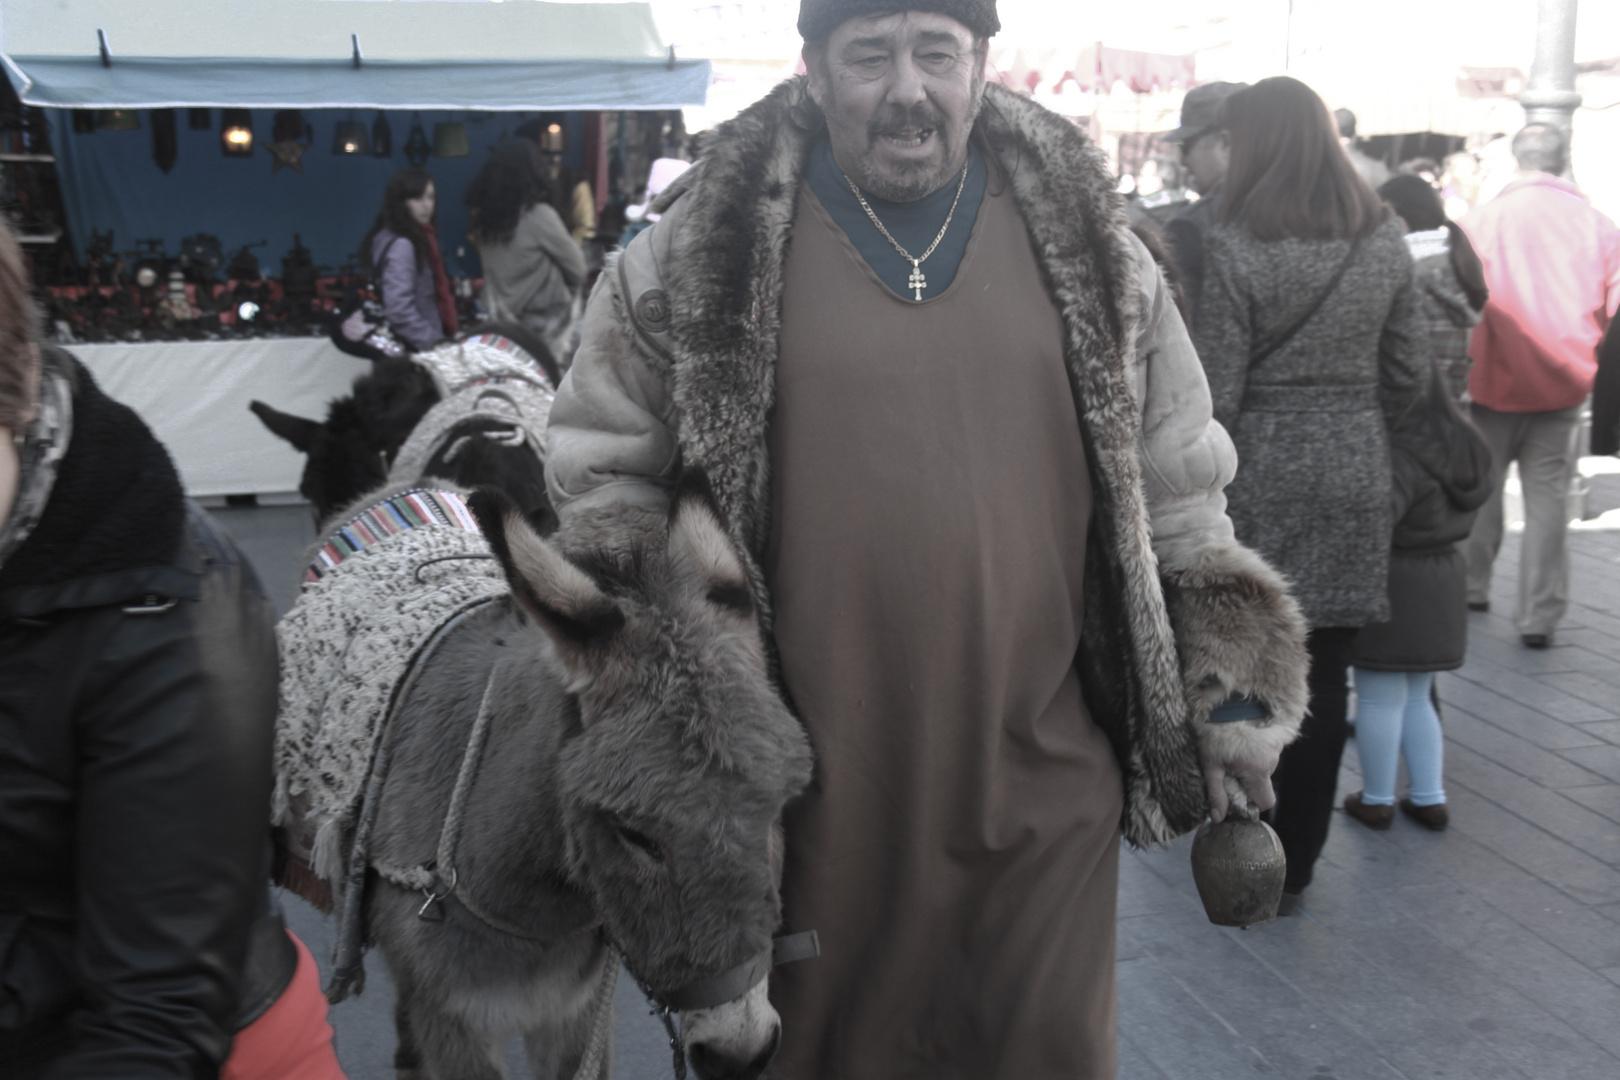 paseador de burros